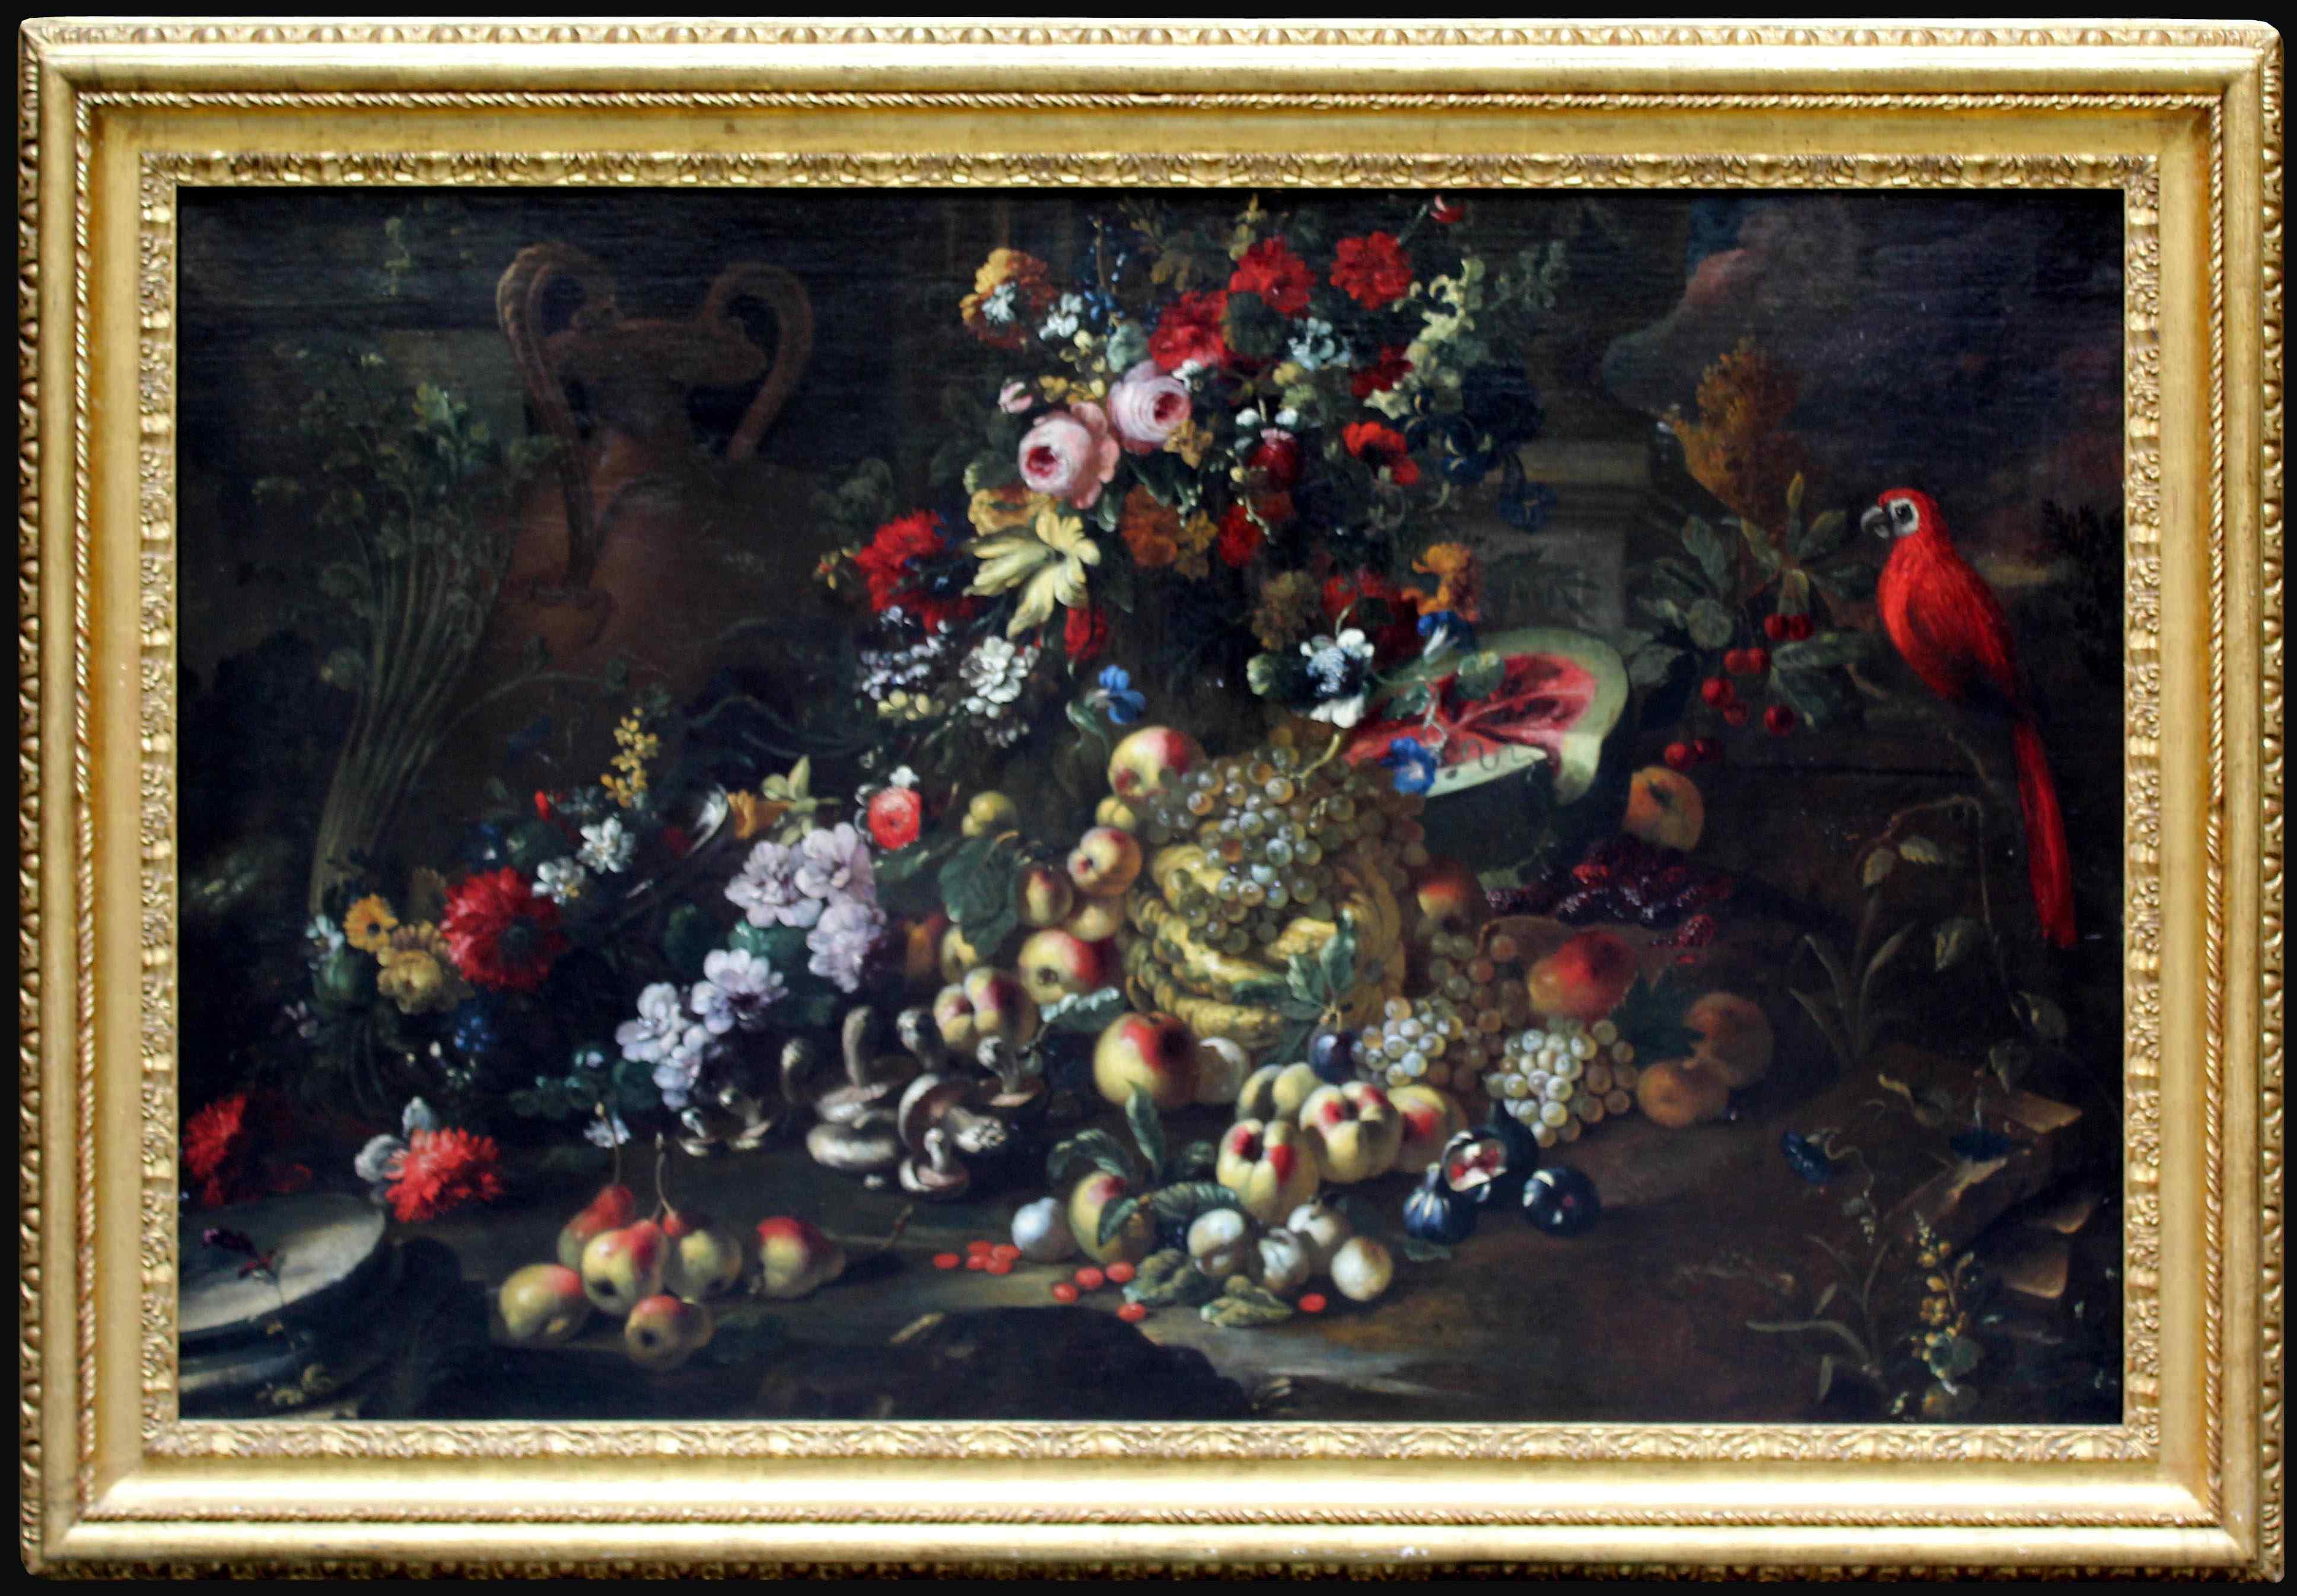 Abraham Brueghel (Anvers, 1631 - Naples, 1697), Nature morte